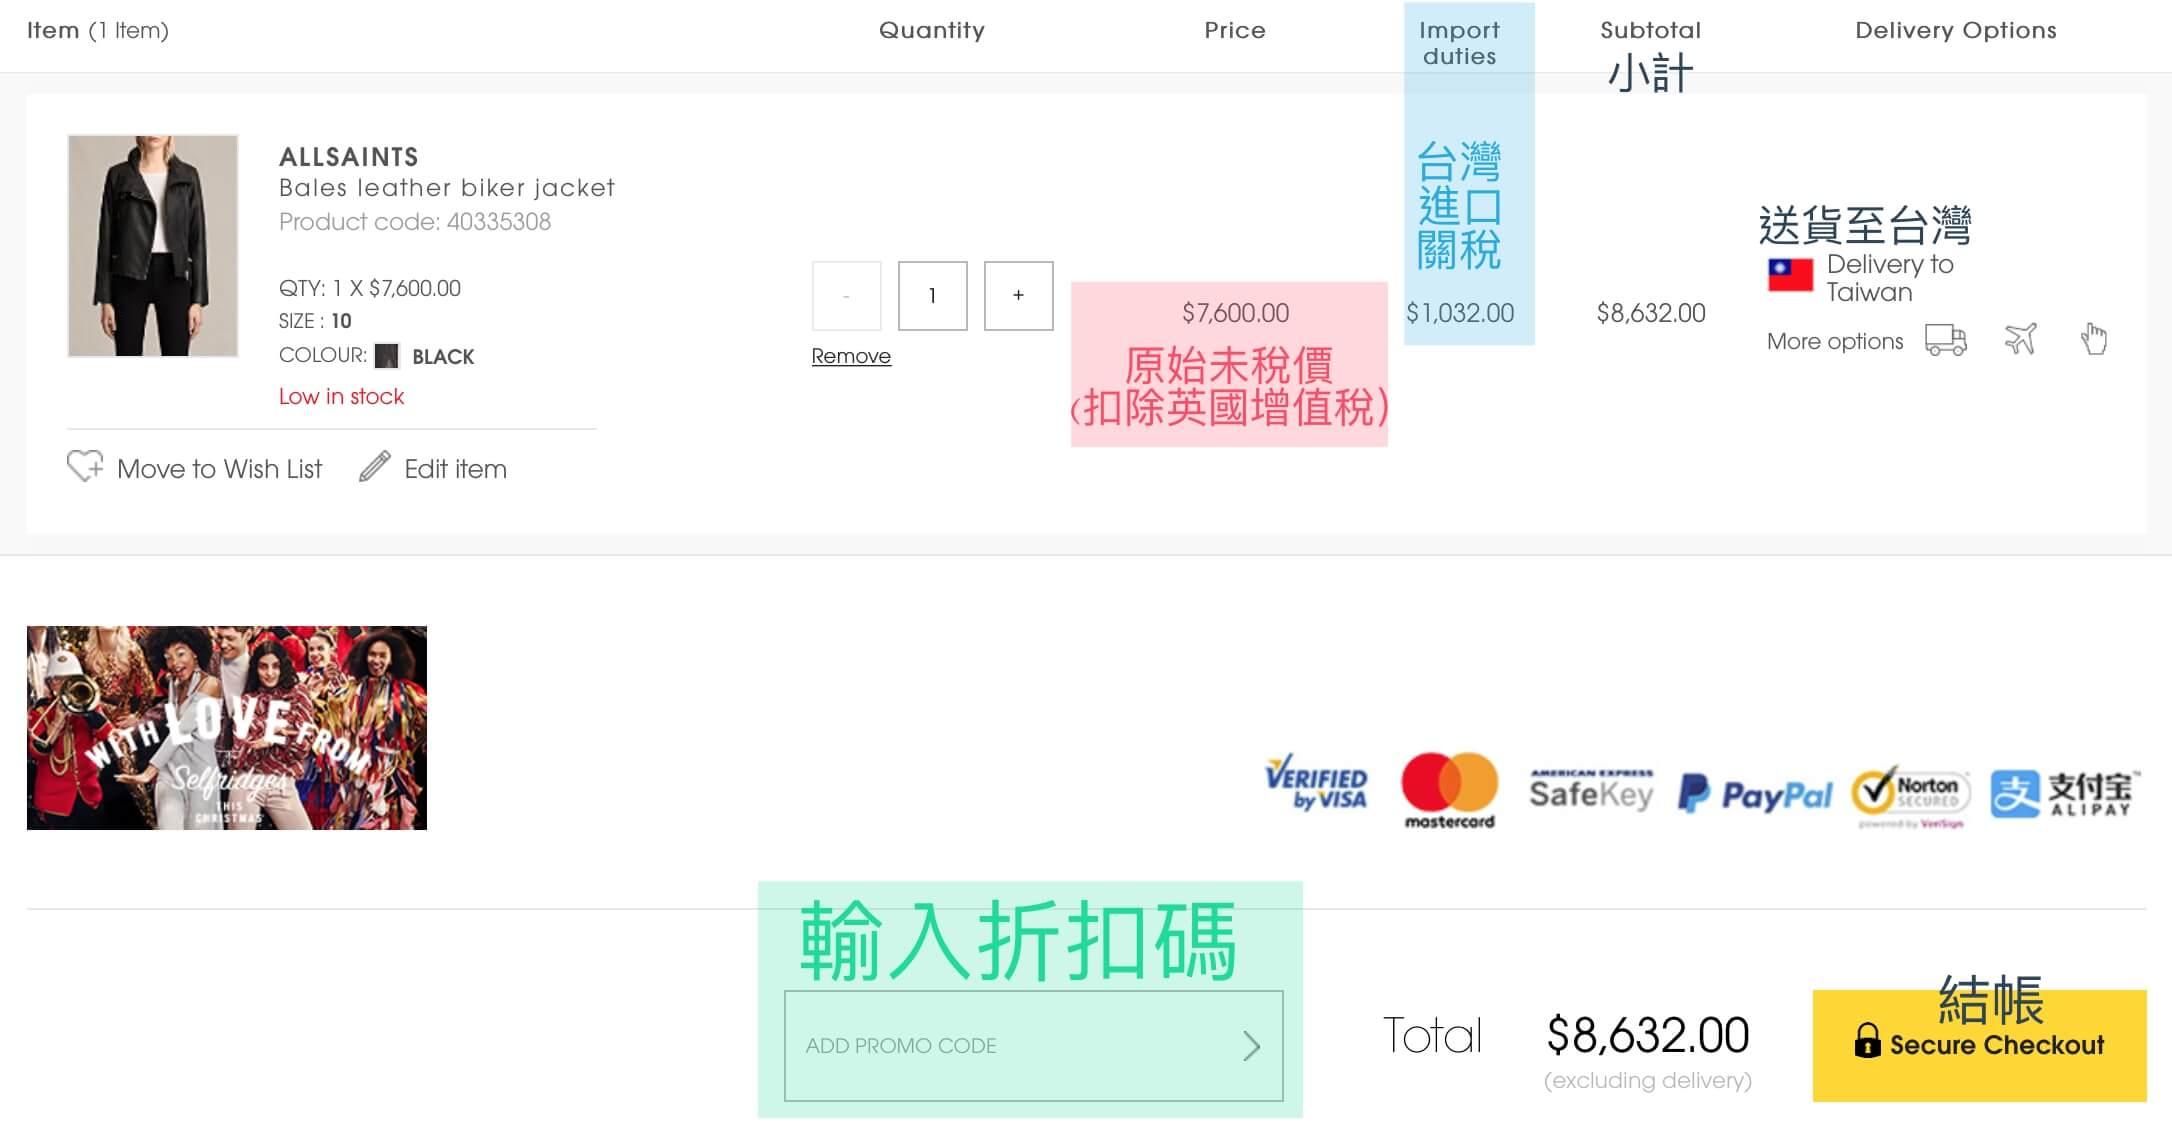 SELFRIDGES購物教學:商品明細可見未稅價及台灣進口關稅